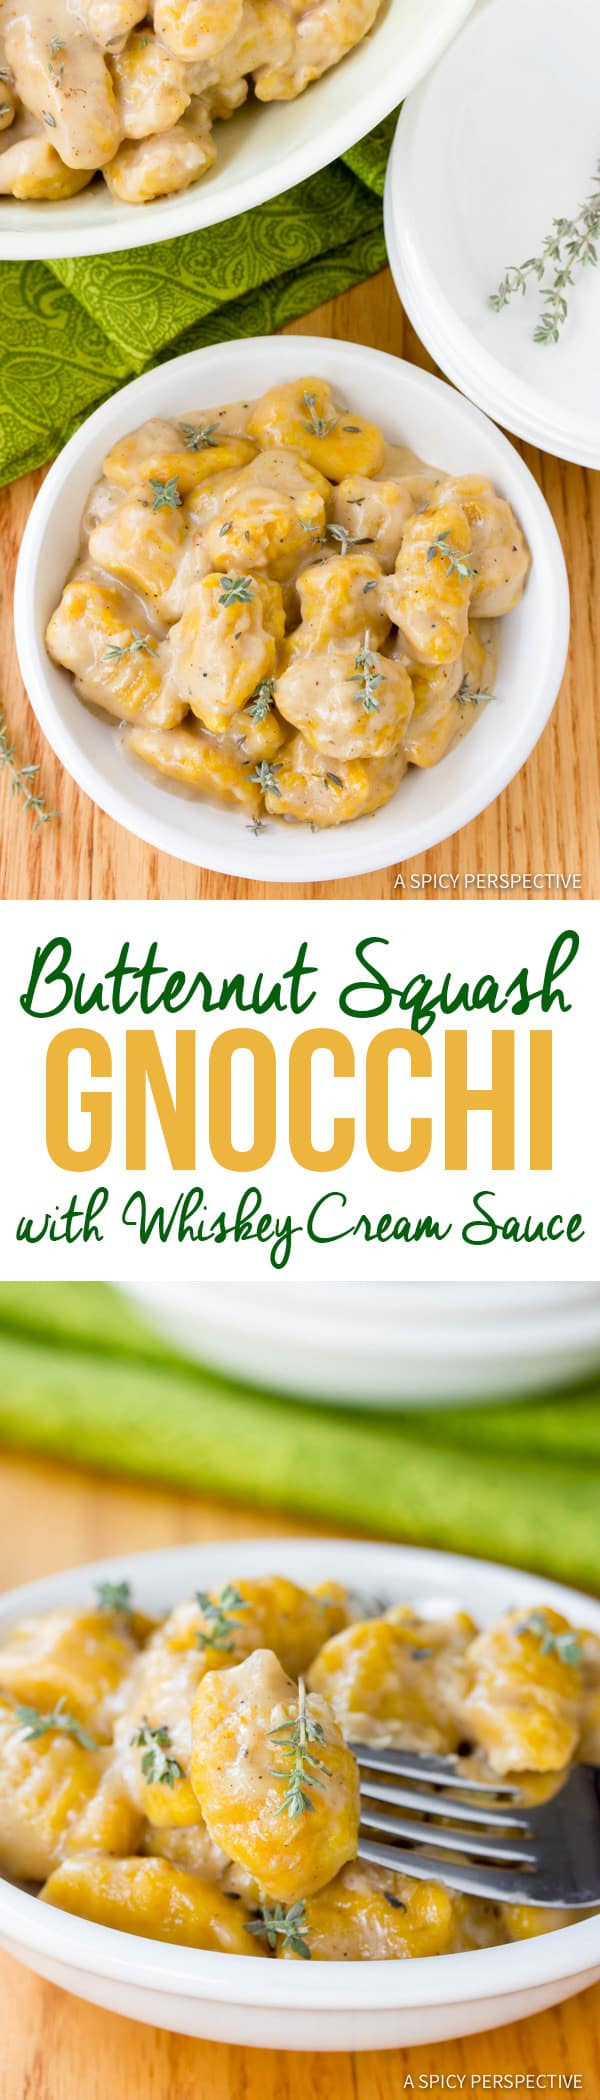 Amazing Butternut Squash Gnocchi with Whiskey Cream Sauce   ASpicyPerspective.com